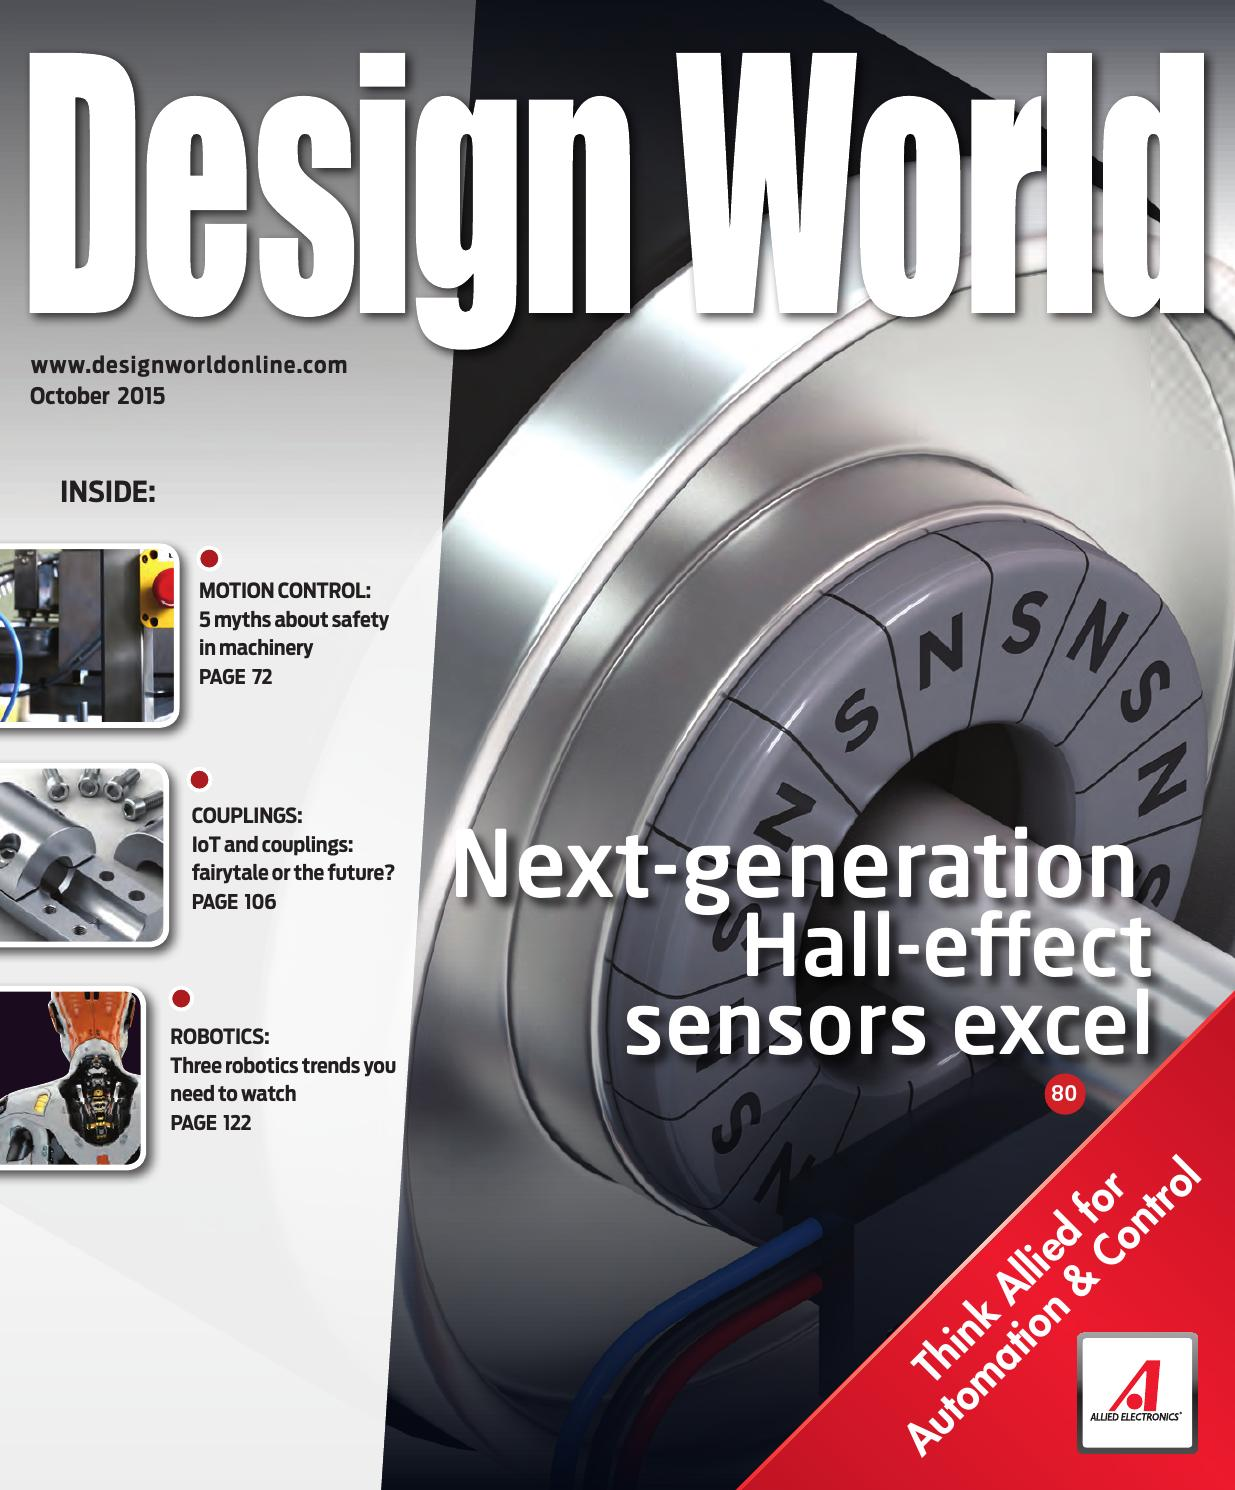 Design World October 2015 By Wtwh Media Llc Issuu Mc Supply Co Bodine Electric Kb Electronics Brake Motor Stepper